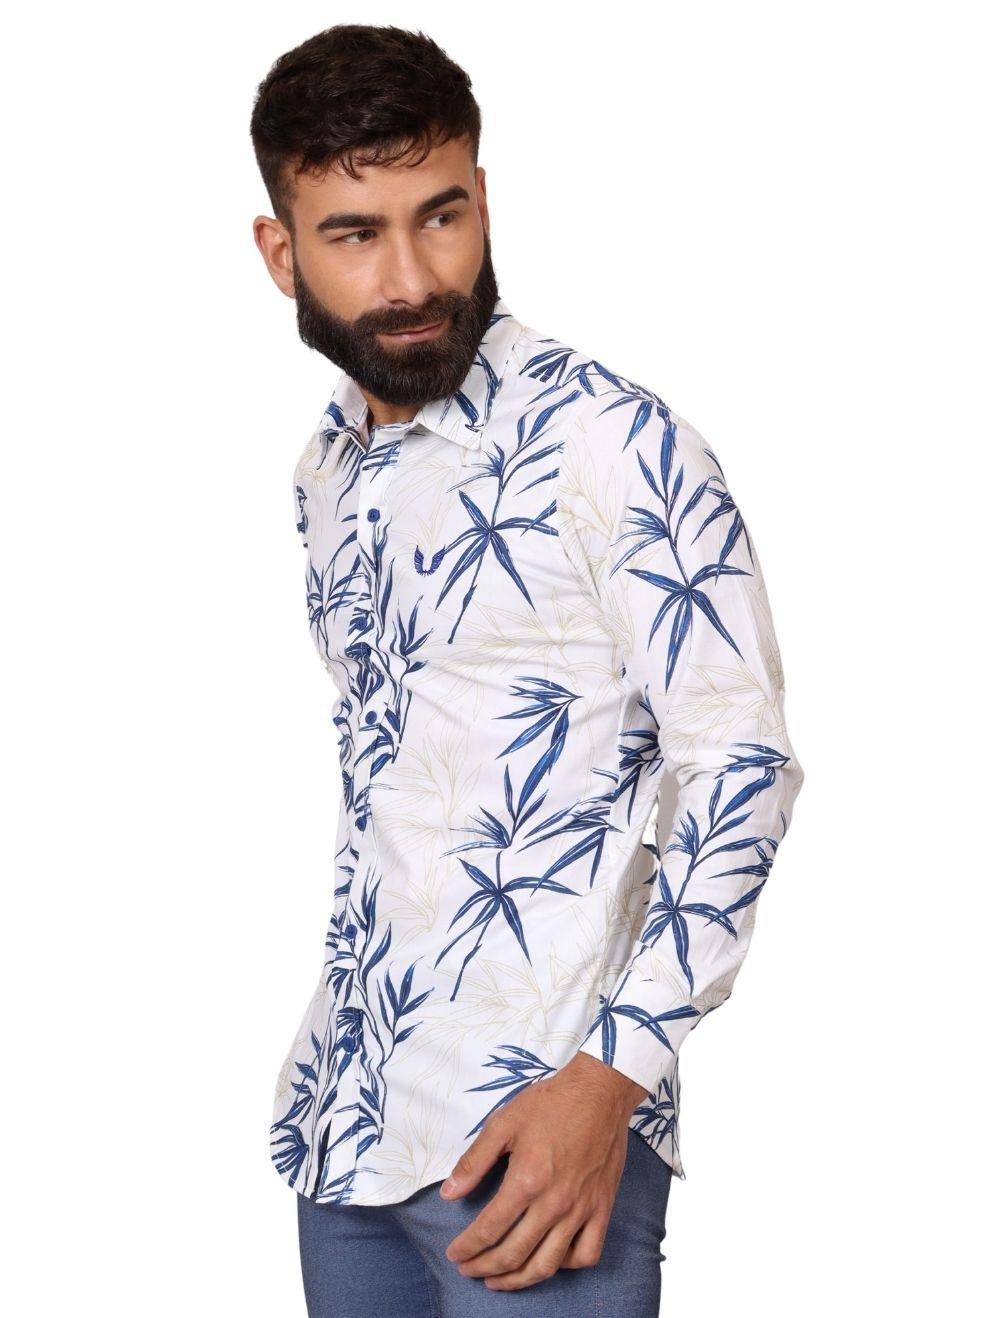 Camisa Masculina Slim Manga Longa com Elastano Estampada